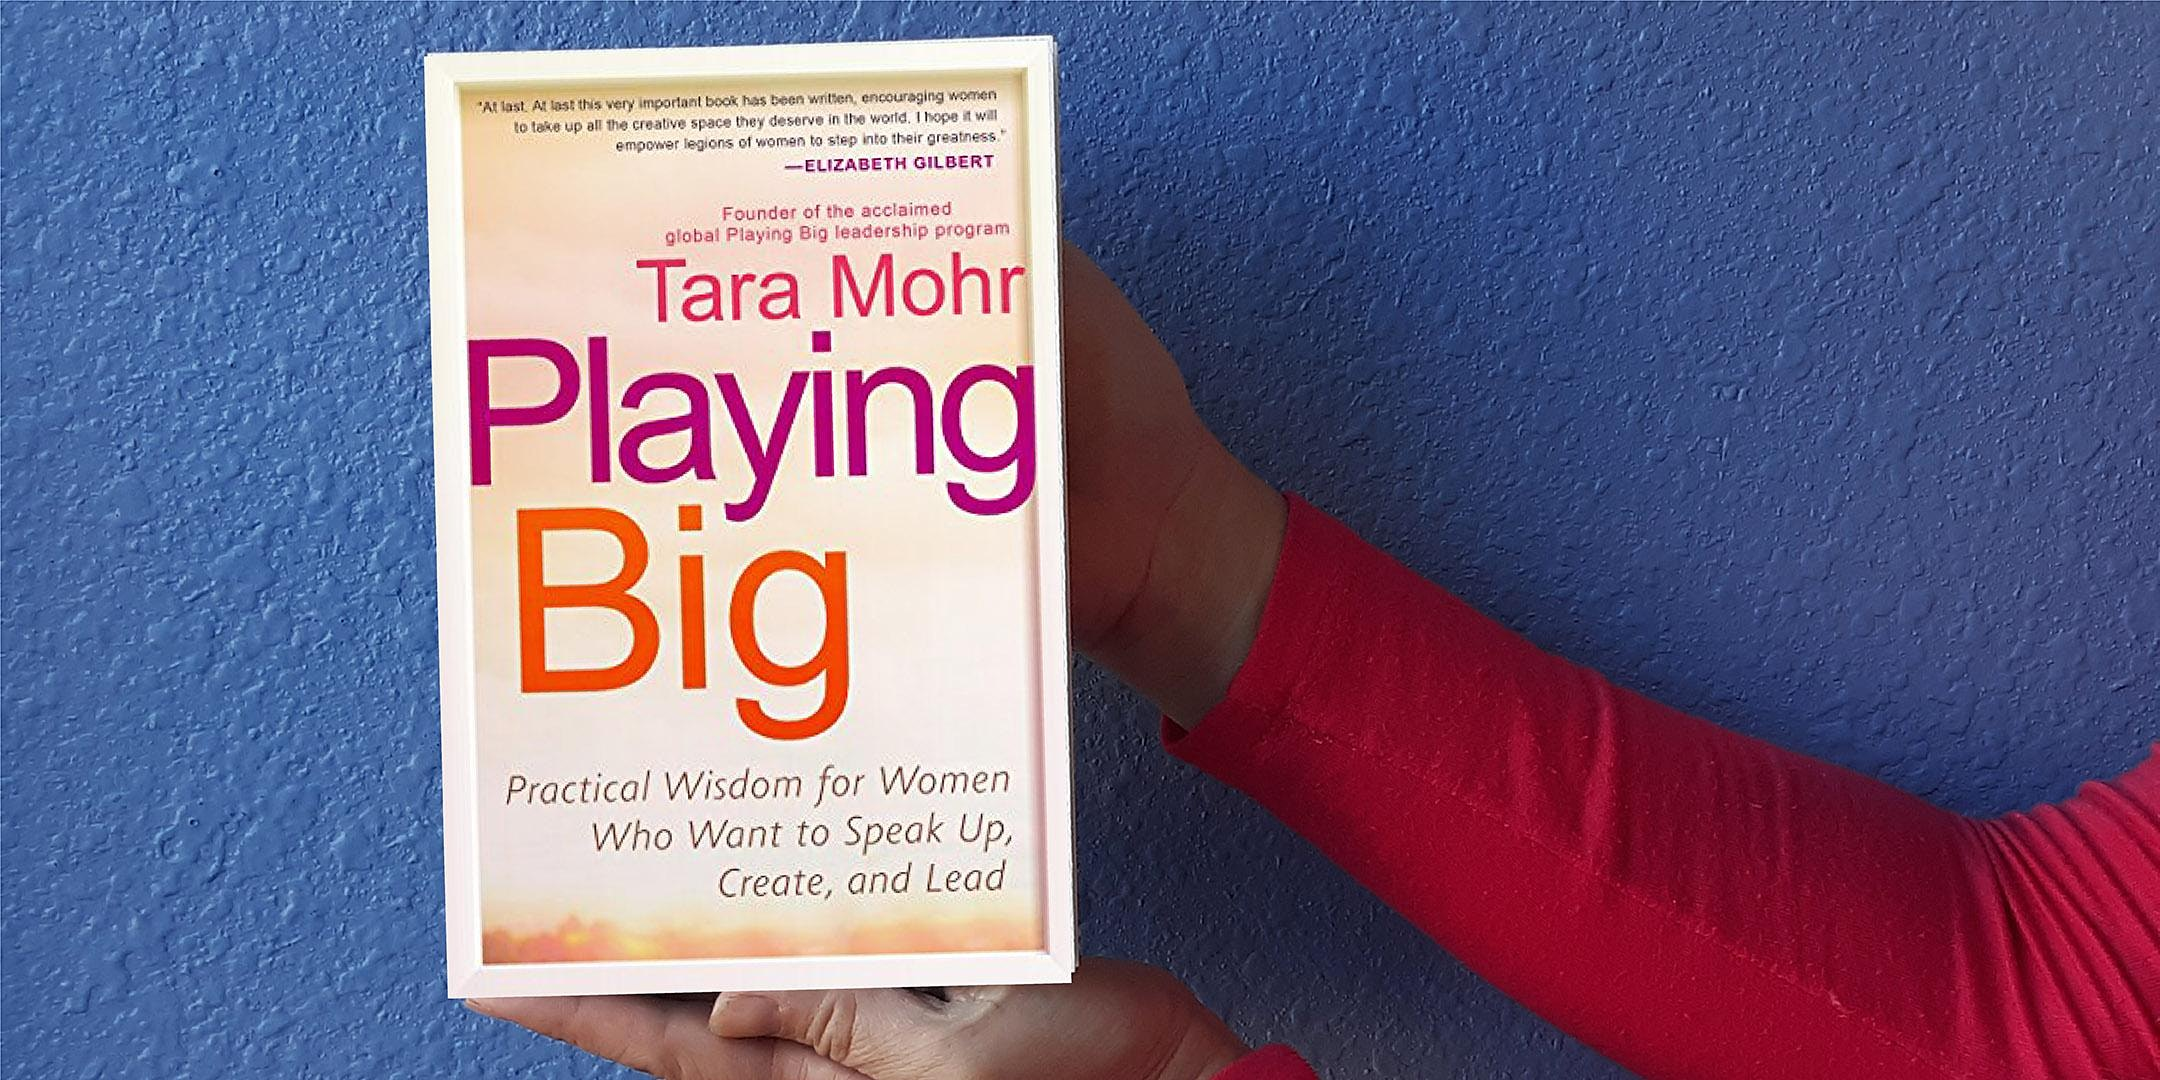 What's Next? Book Club (Virtual) - Playing Big